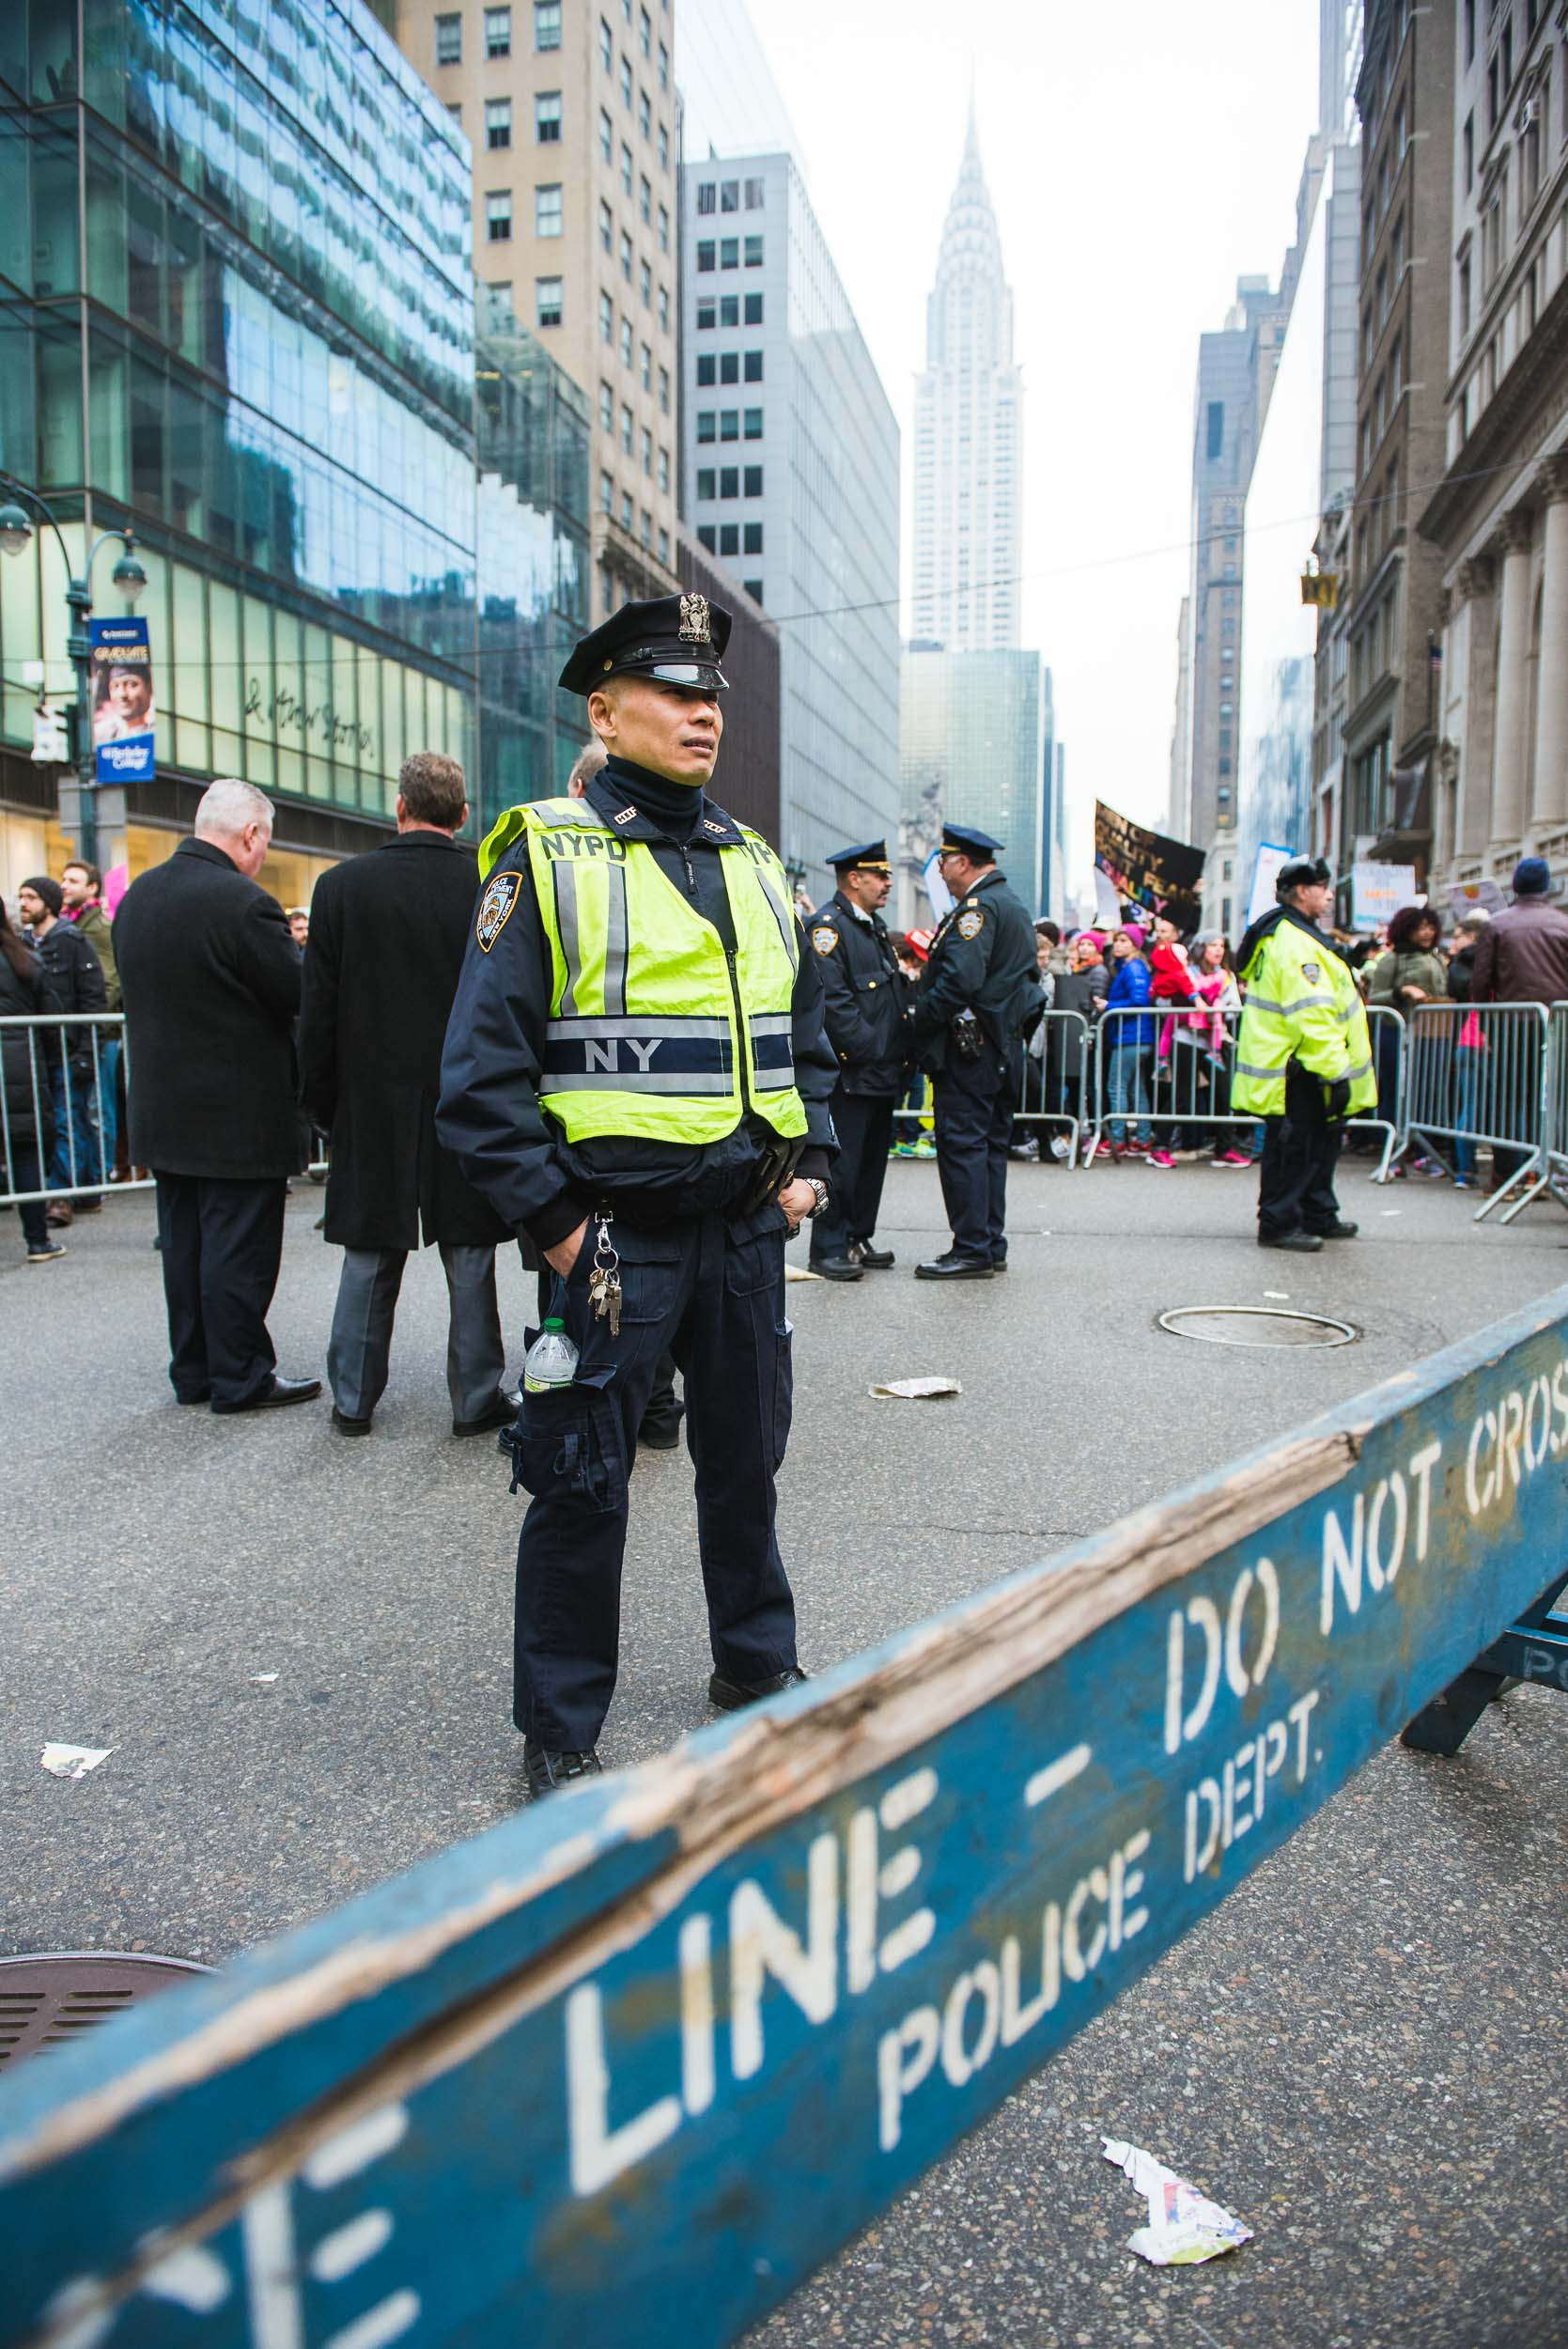 20170121 - NYC Women's March-9.jpg